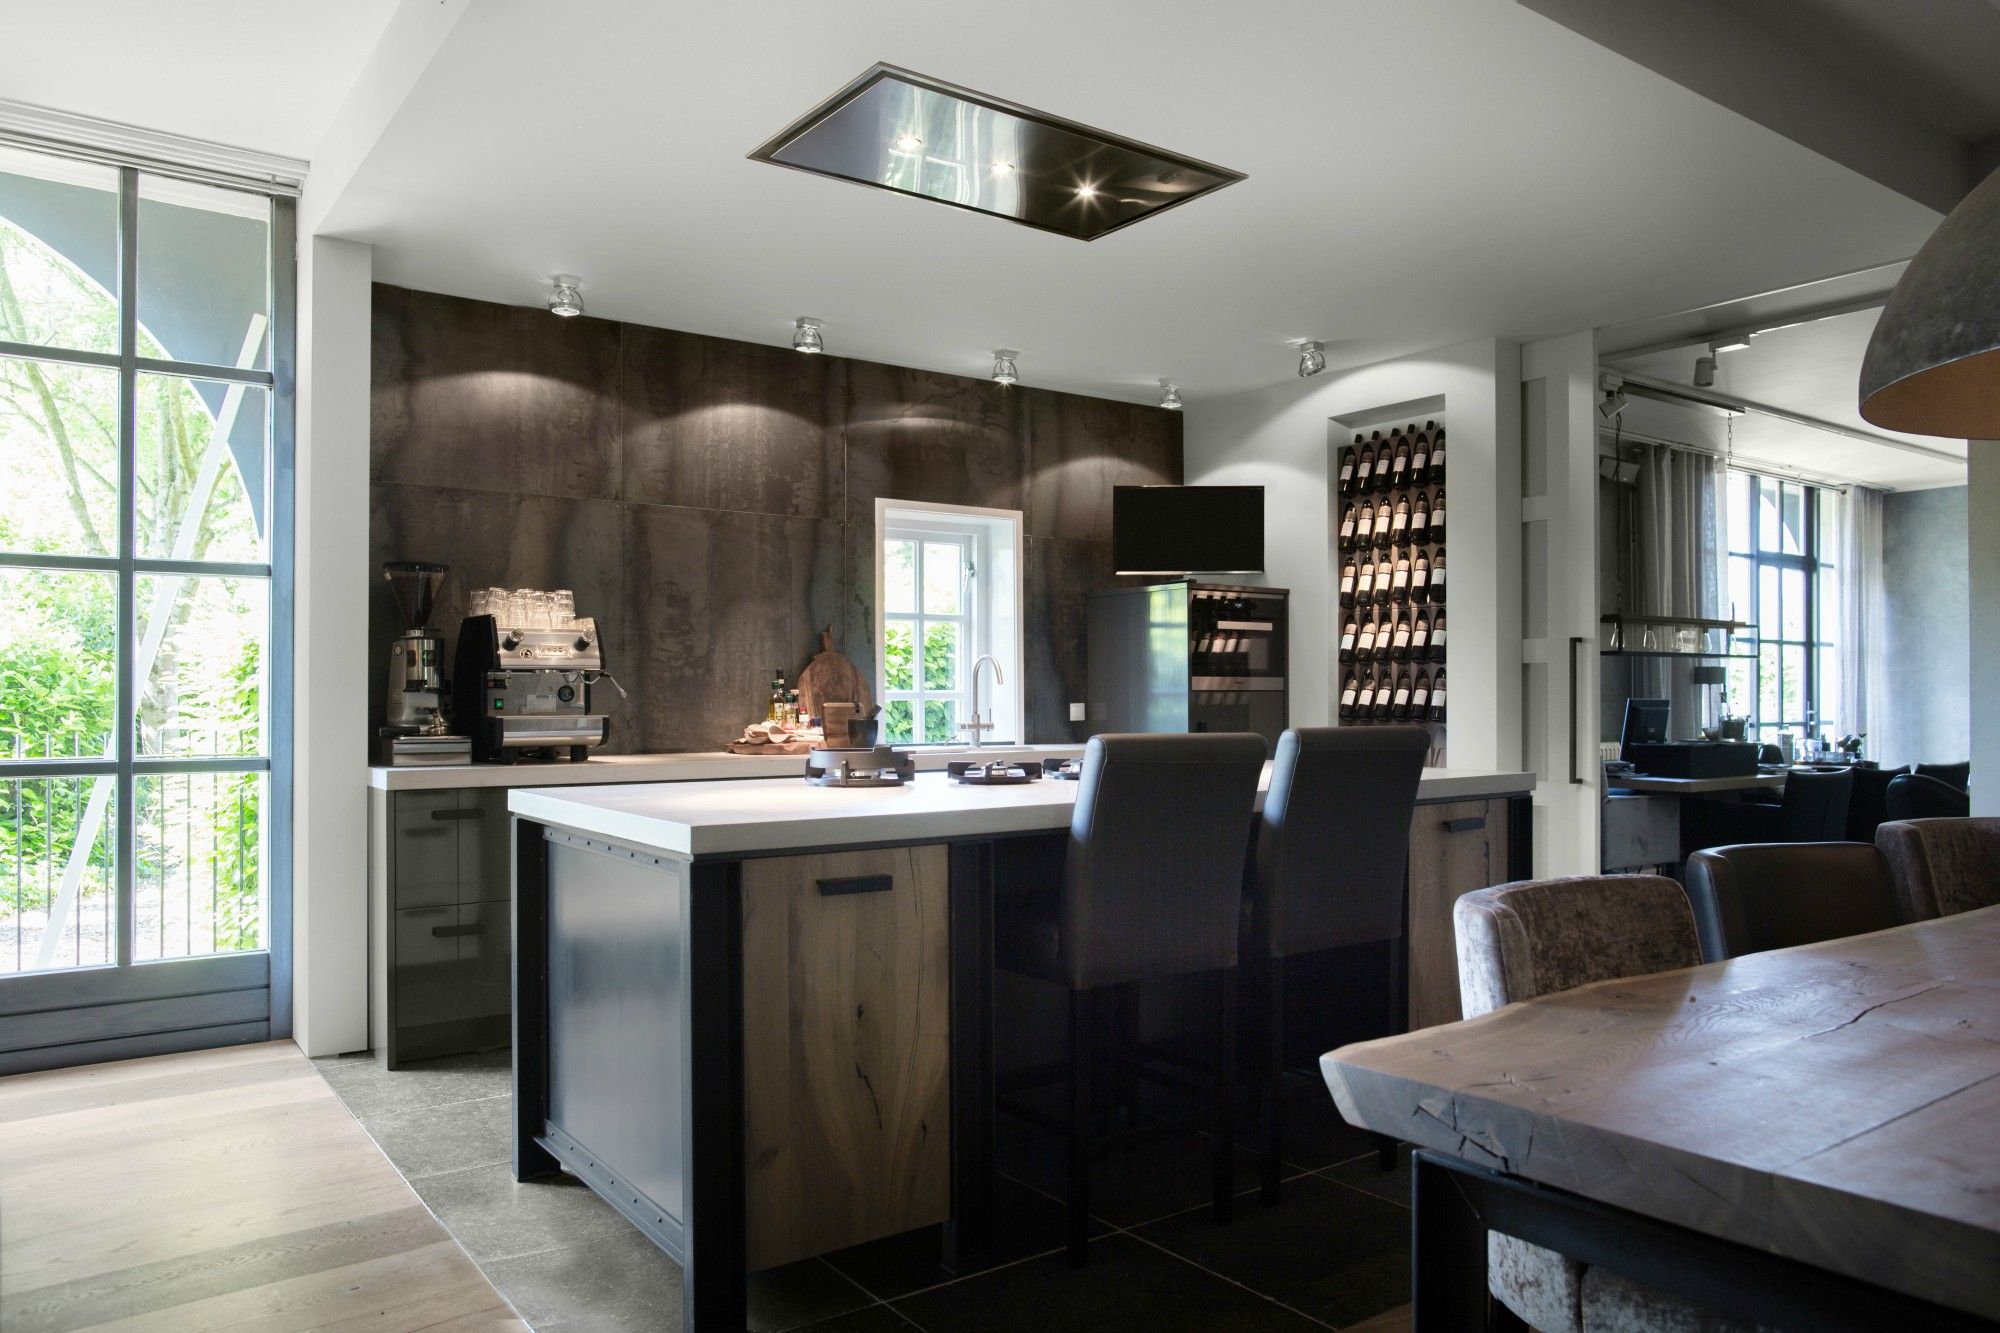 Plafond Afzuigkap Keuken : Afzuigkap model 8662 . mooi weggewerkt in het plafond. #kitchen